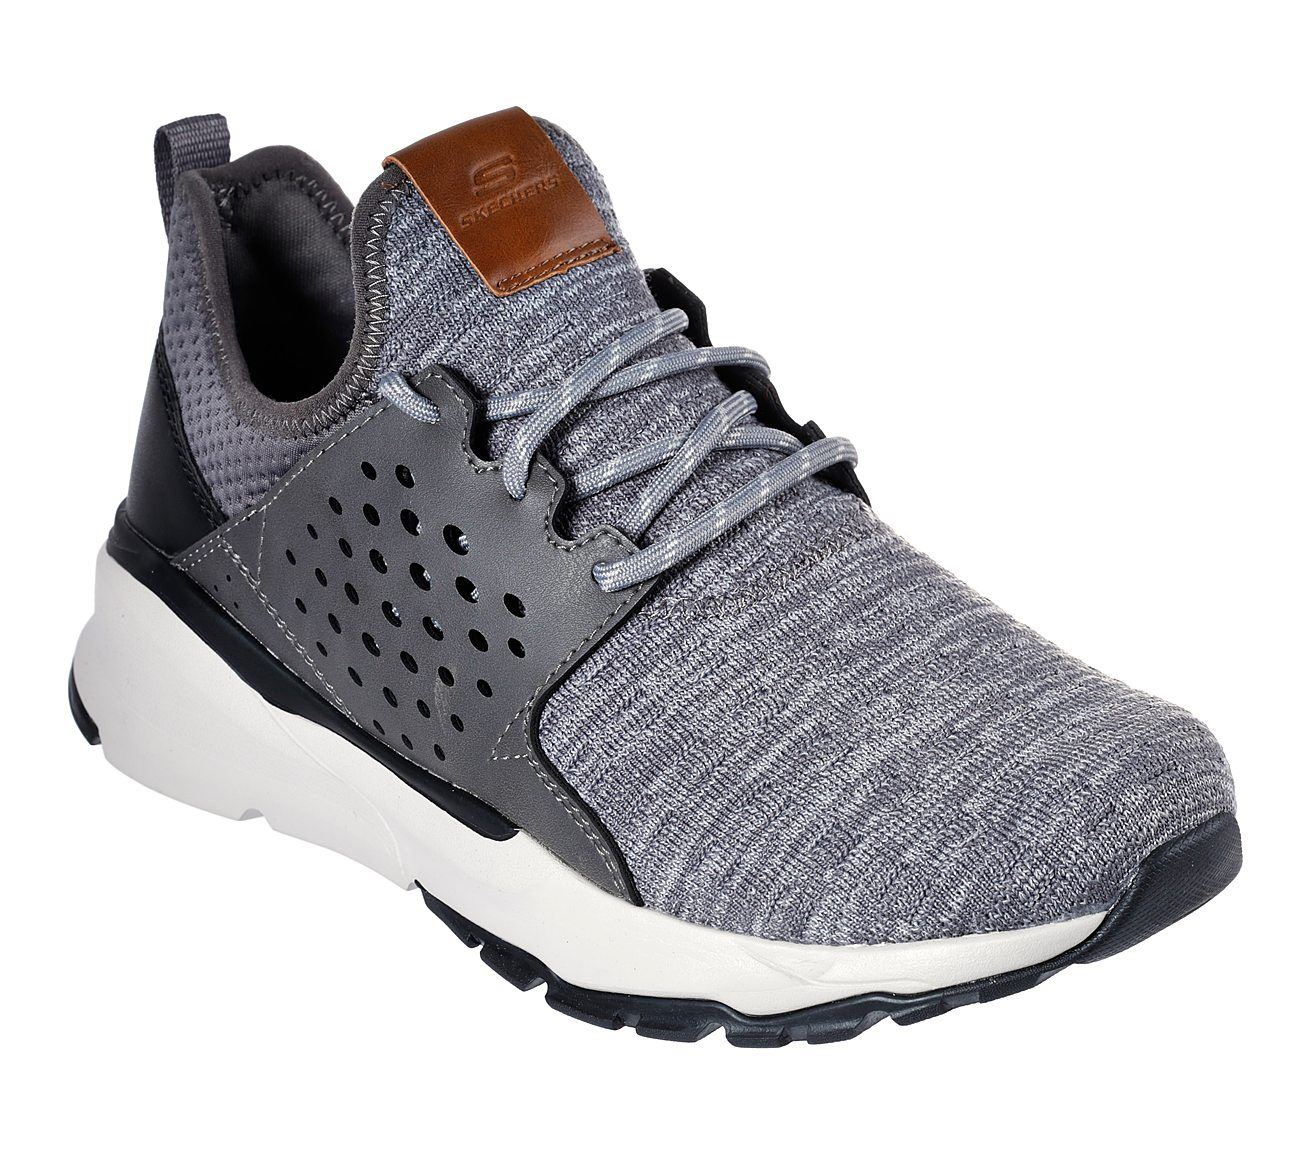 Cuervo reembolso acantilado  Skechers mens shoes velton relven - in grey   eBay